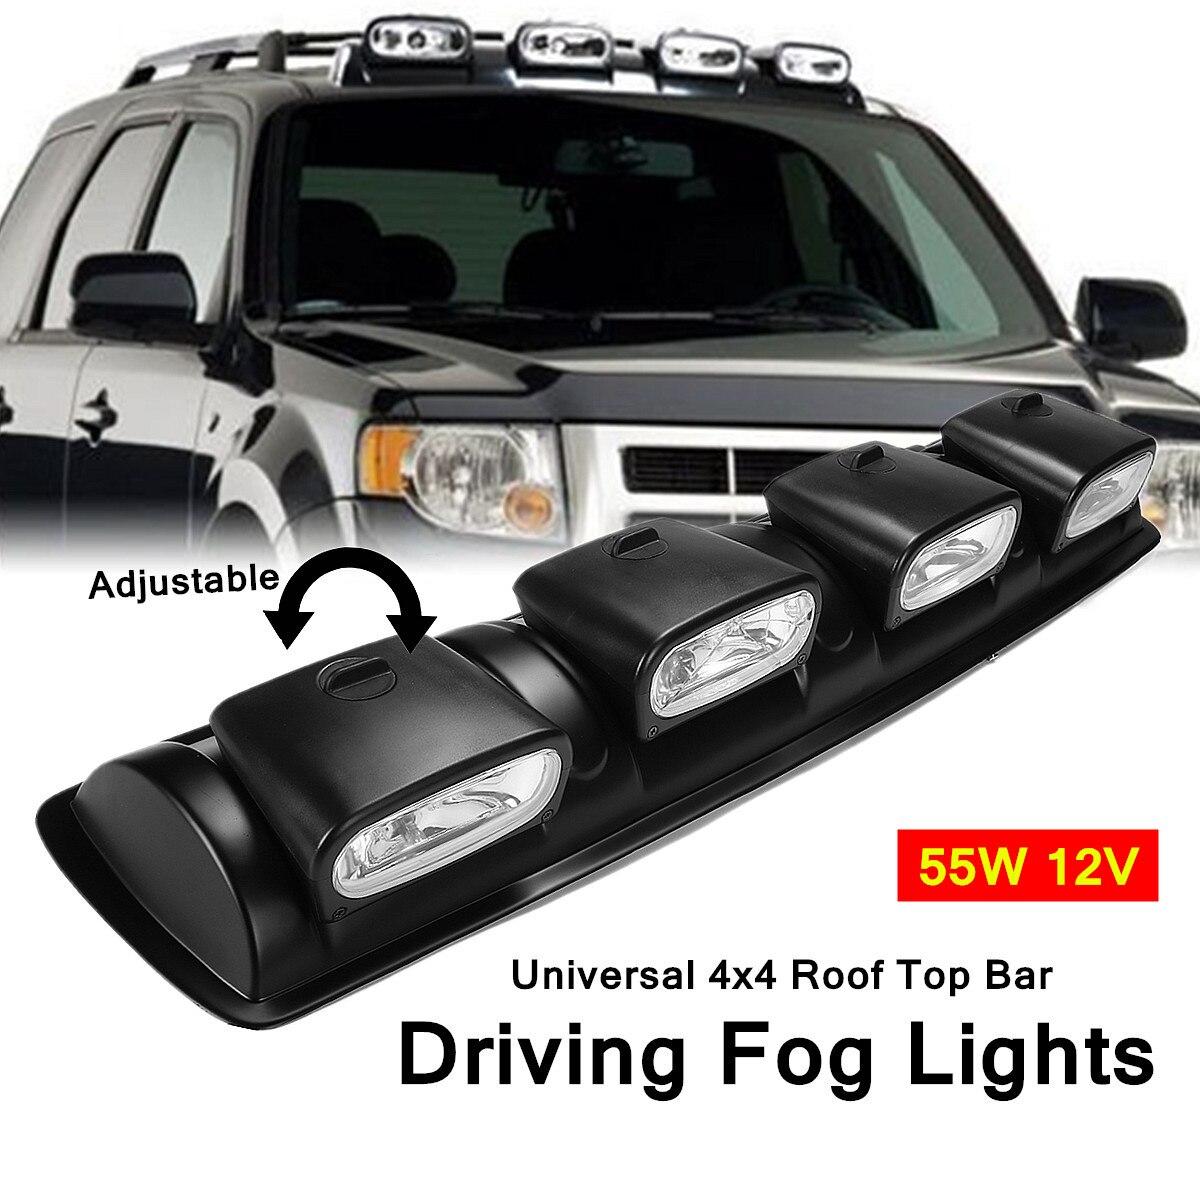 Universal 4x4 Roof Top Bar Driving Fog Lights 4 Lens Offroad Spot Head Lamps 55W 12V ABS Plastic Bracket + H3 Bulb Fits Vehicles